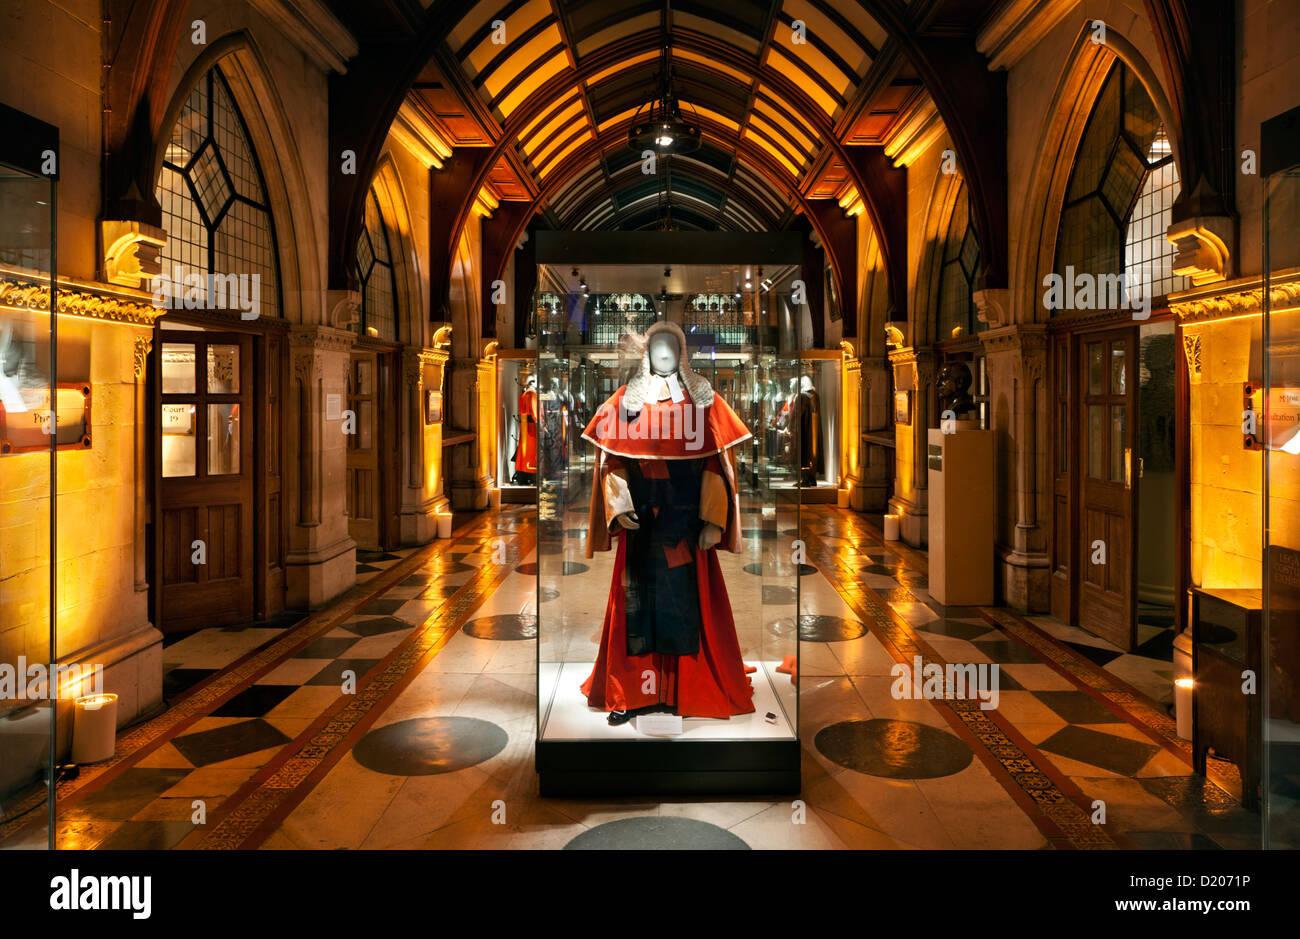 Musée de robes et perruques juridique, Royal Courts of Justice, Londres, Angleterre, Grande-Bretagne Photo Stock